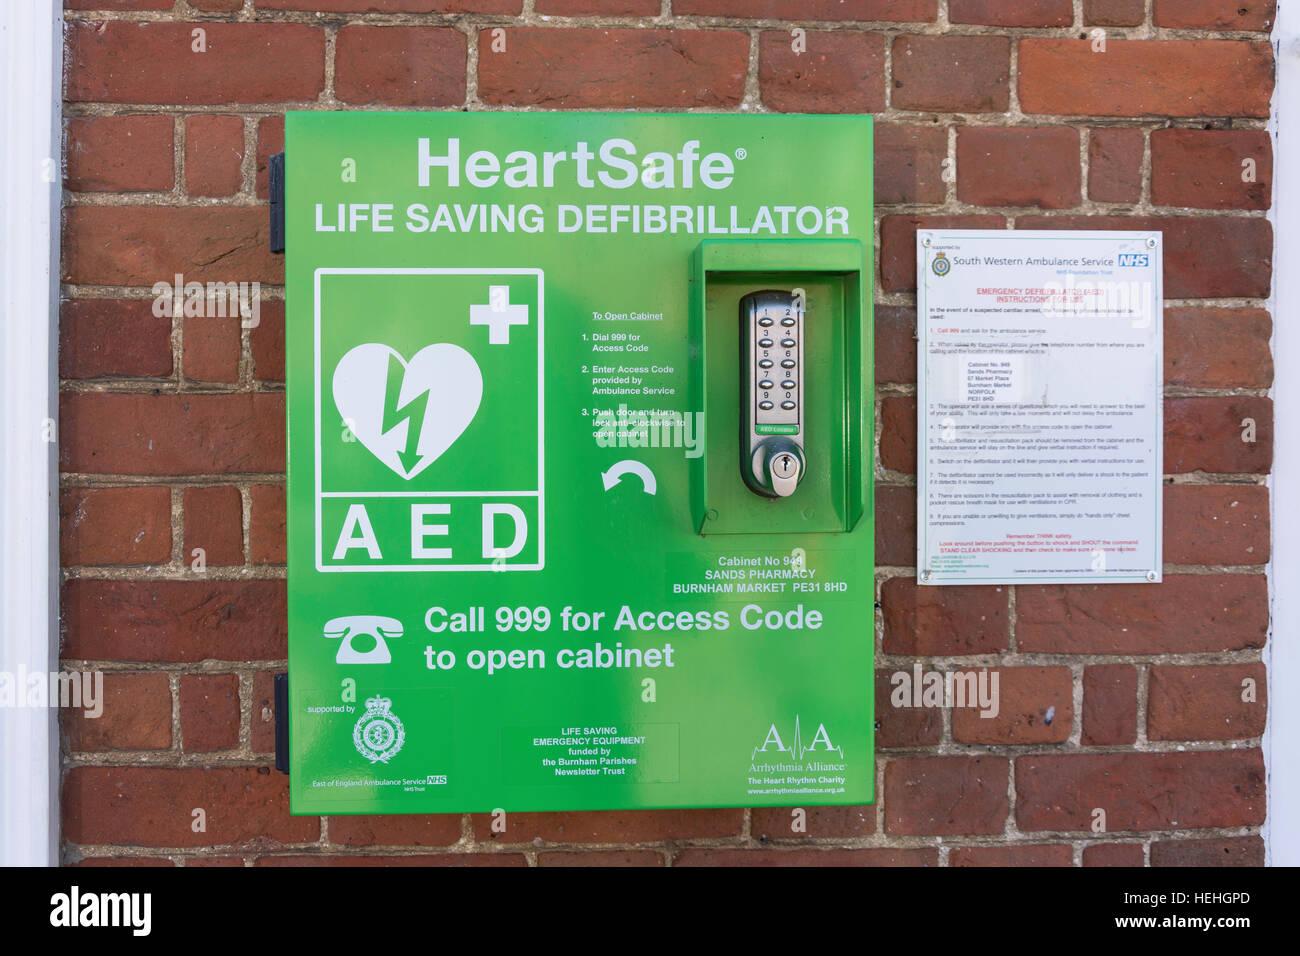 HeartSafe Life Saving Defribrillator on exterior wall, The Green, Market Place, Burnham Market, Norfolk, England, - Stock Image